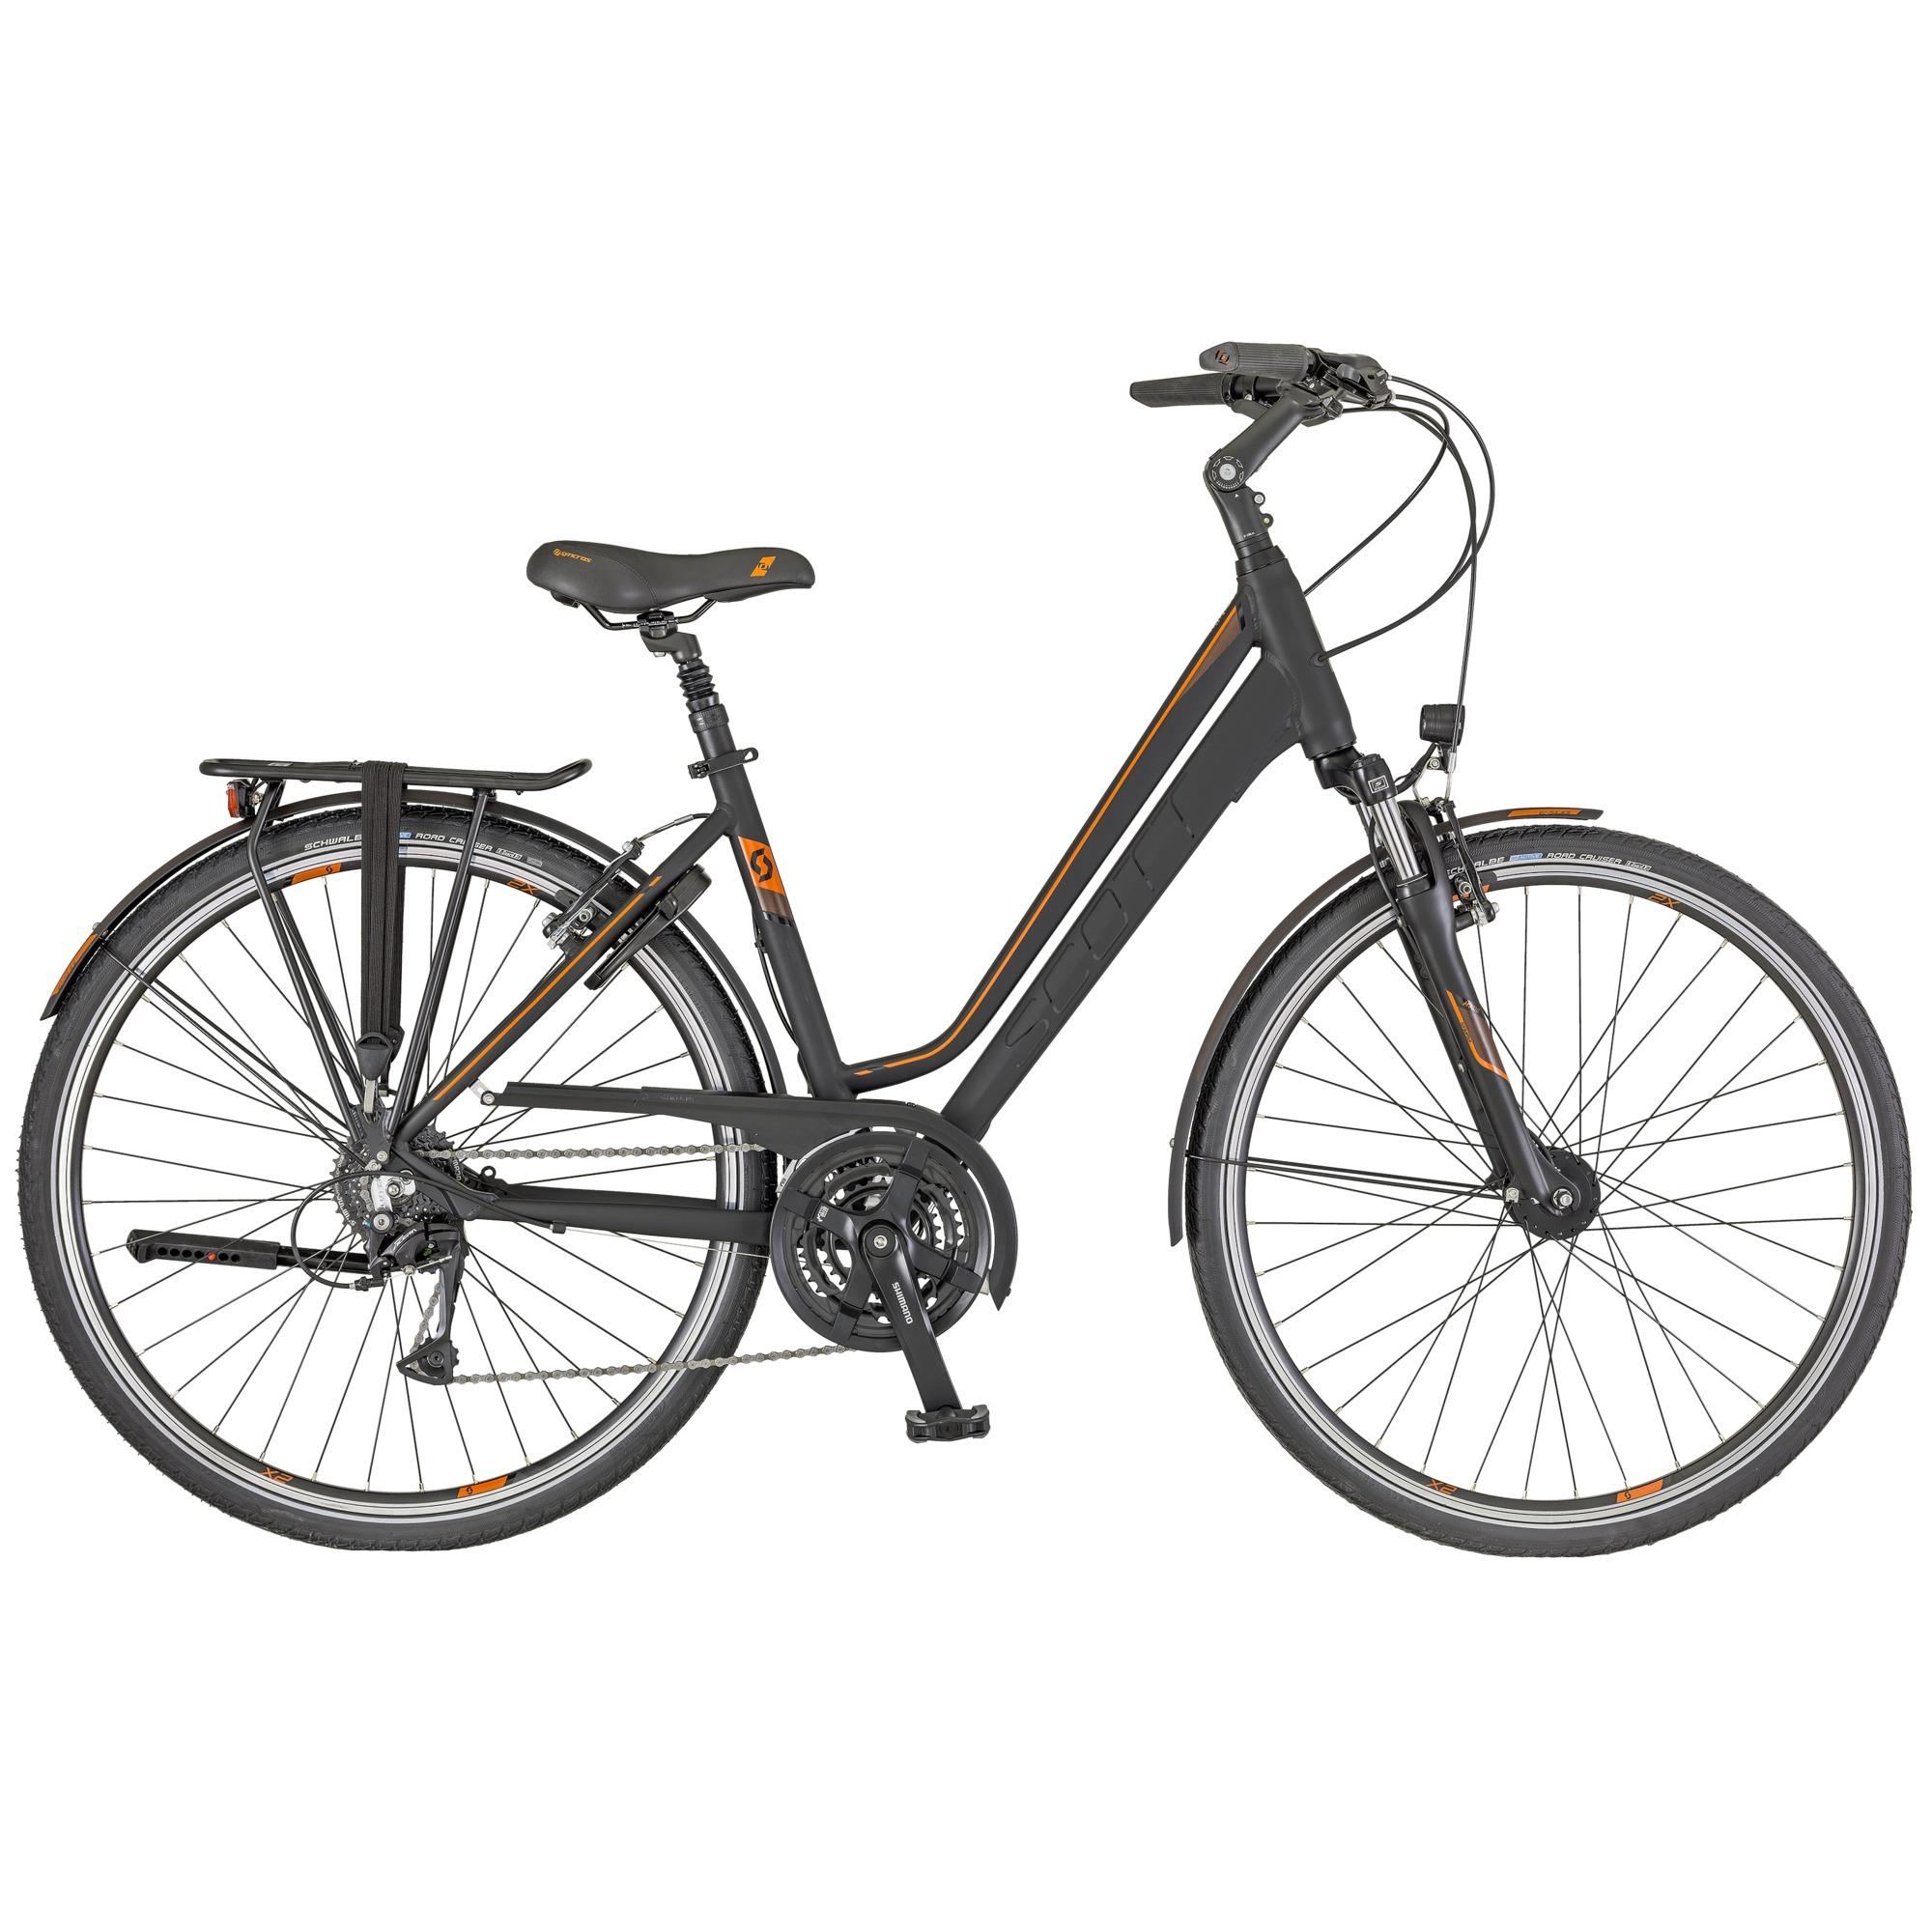 SCOTT Sub Comfort 10 Unisex Bike L - Zweirad Homann